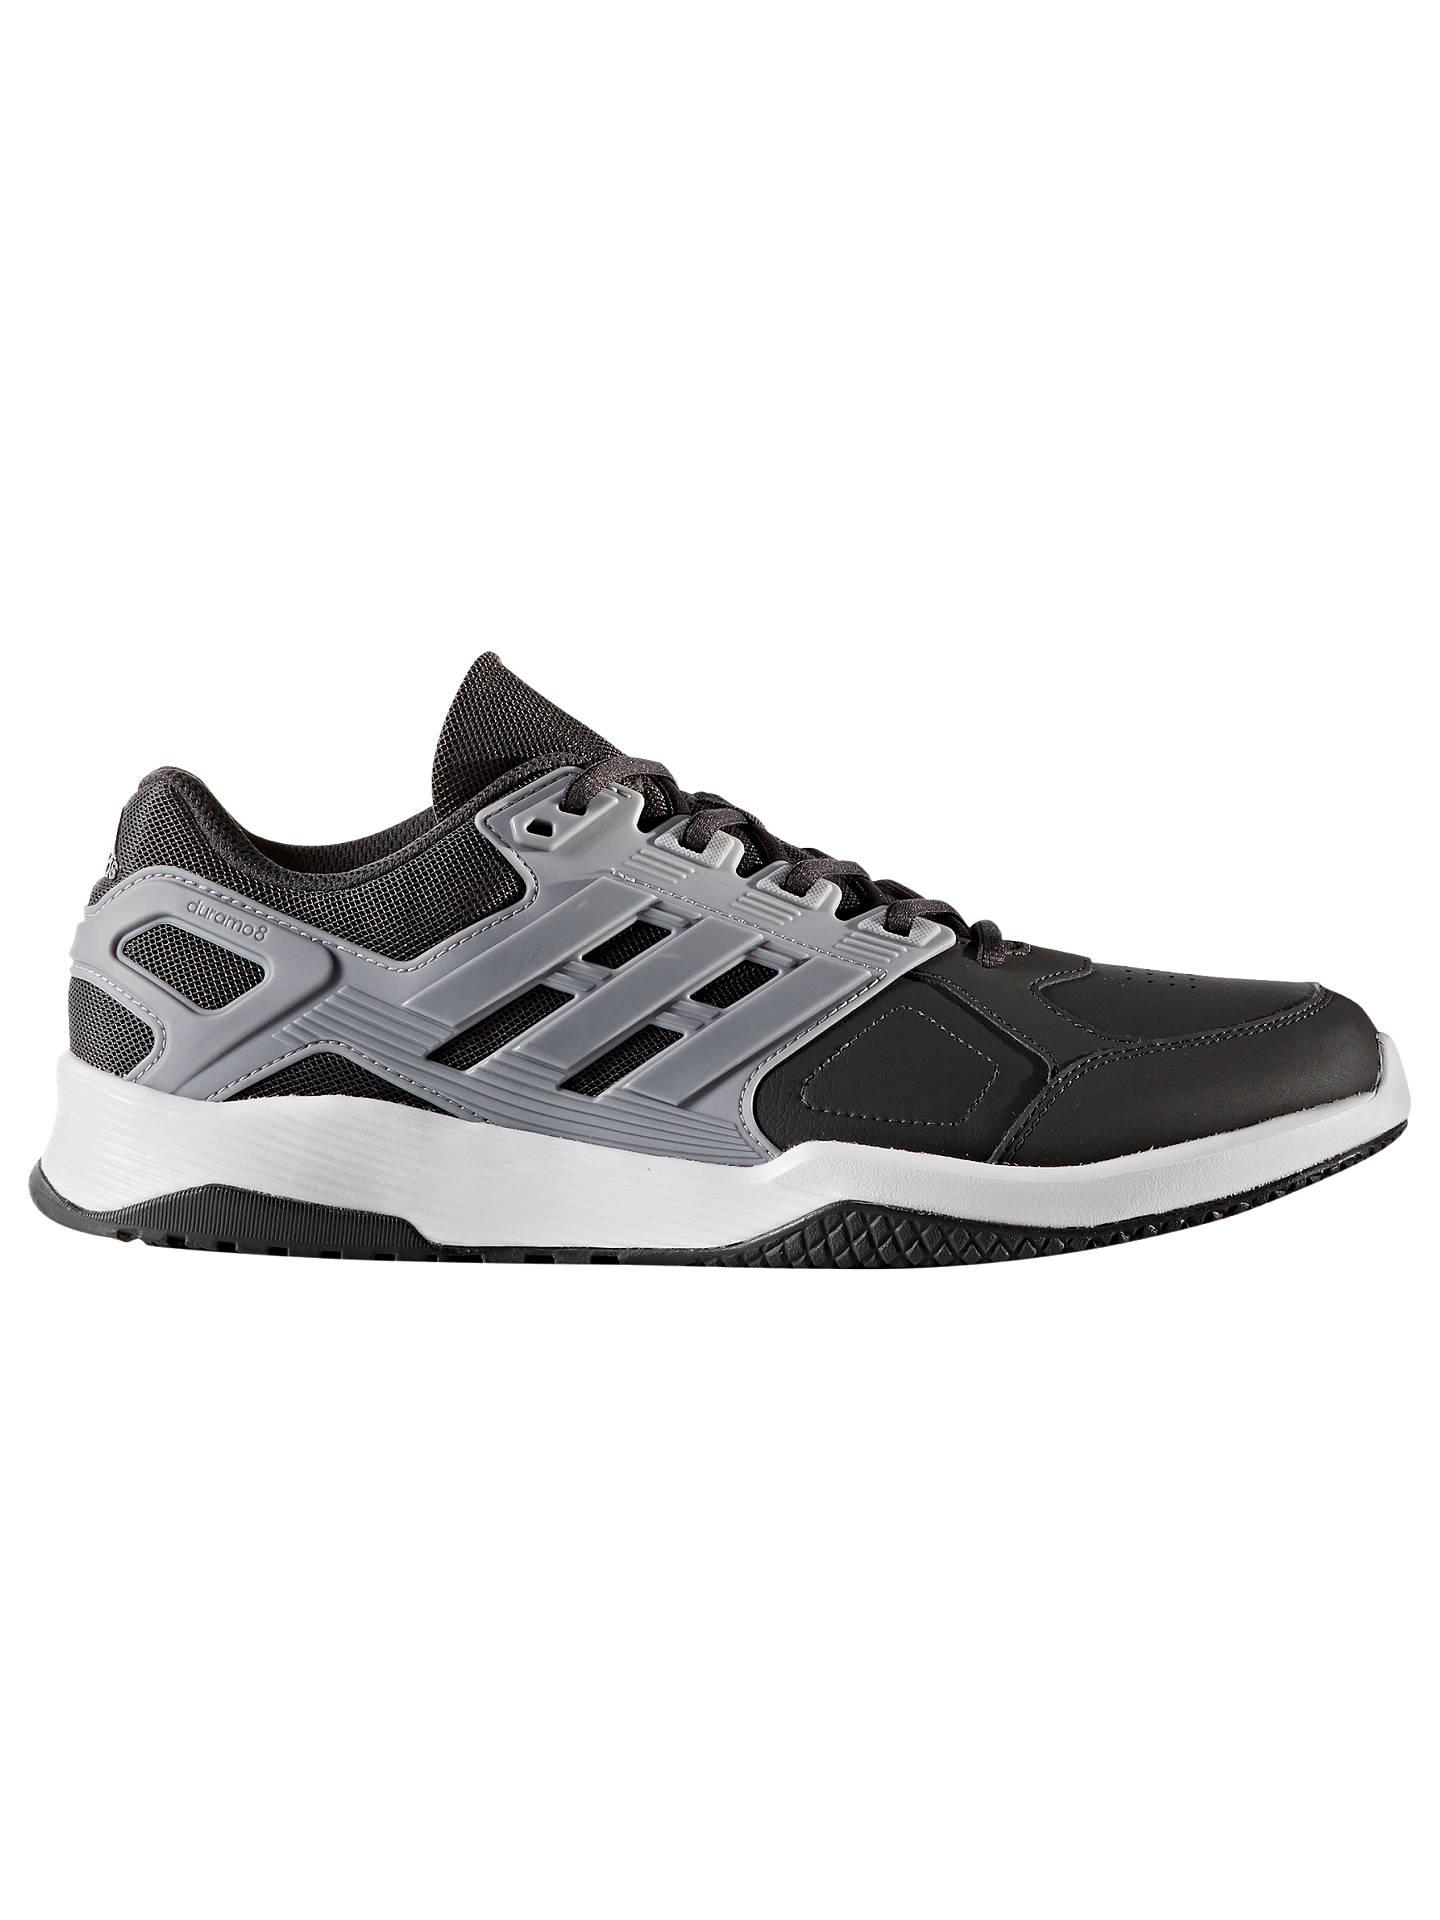 separation shoes 45f56 eda69 Buy adidas Duramo 8 Men s Training Shoes, Black, Black, 7 Online at  johnlewis ...